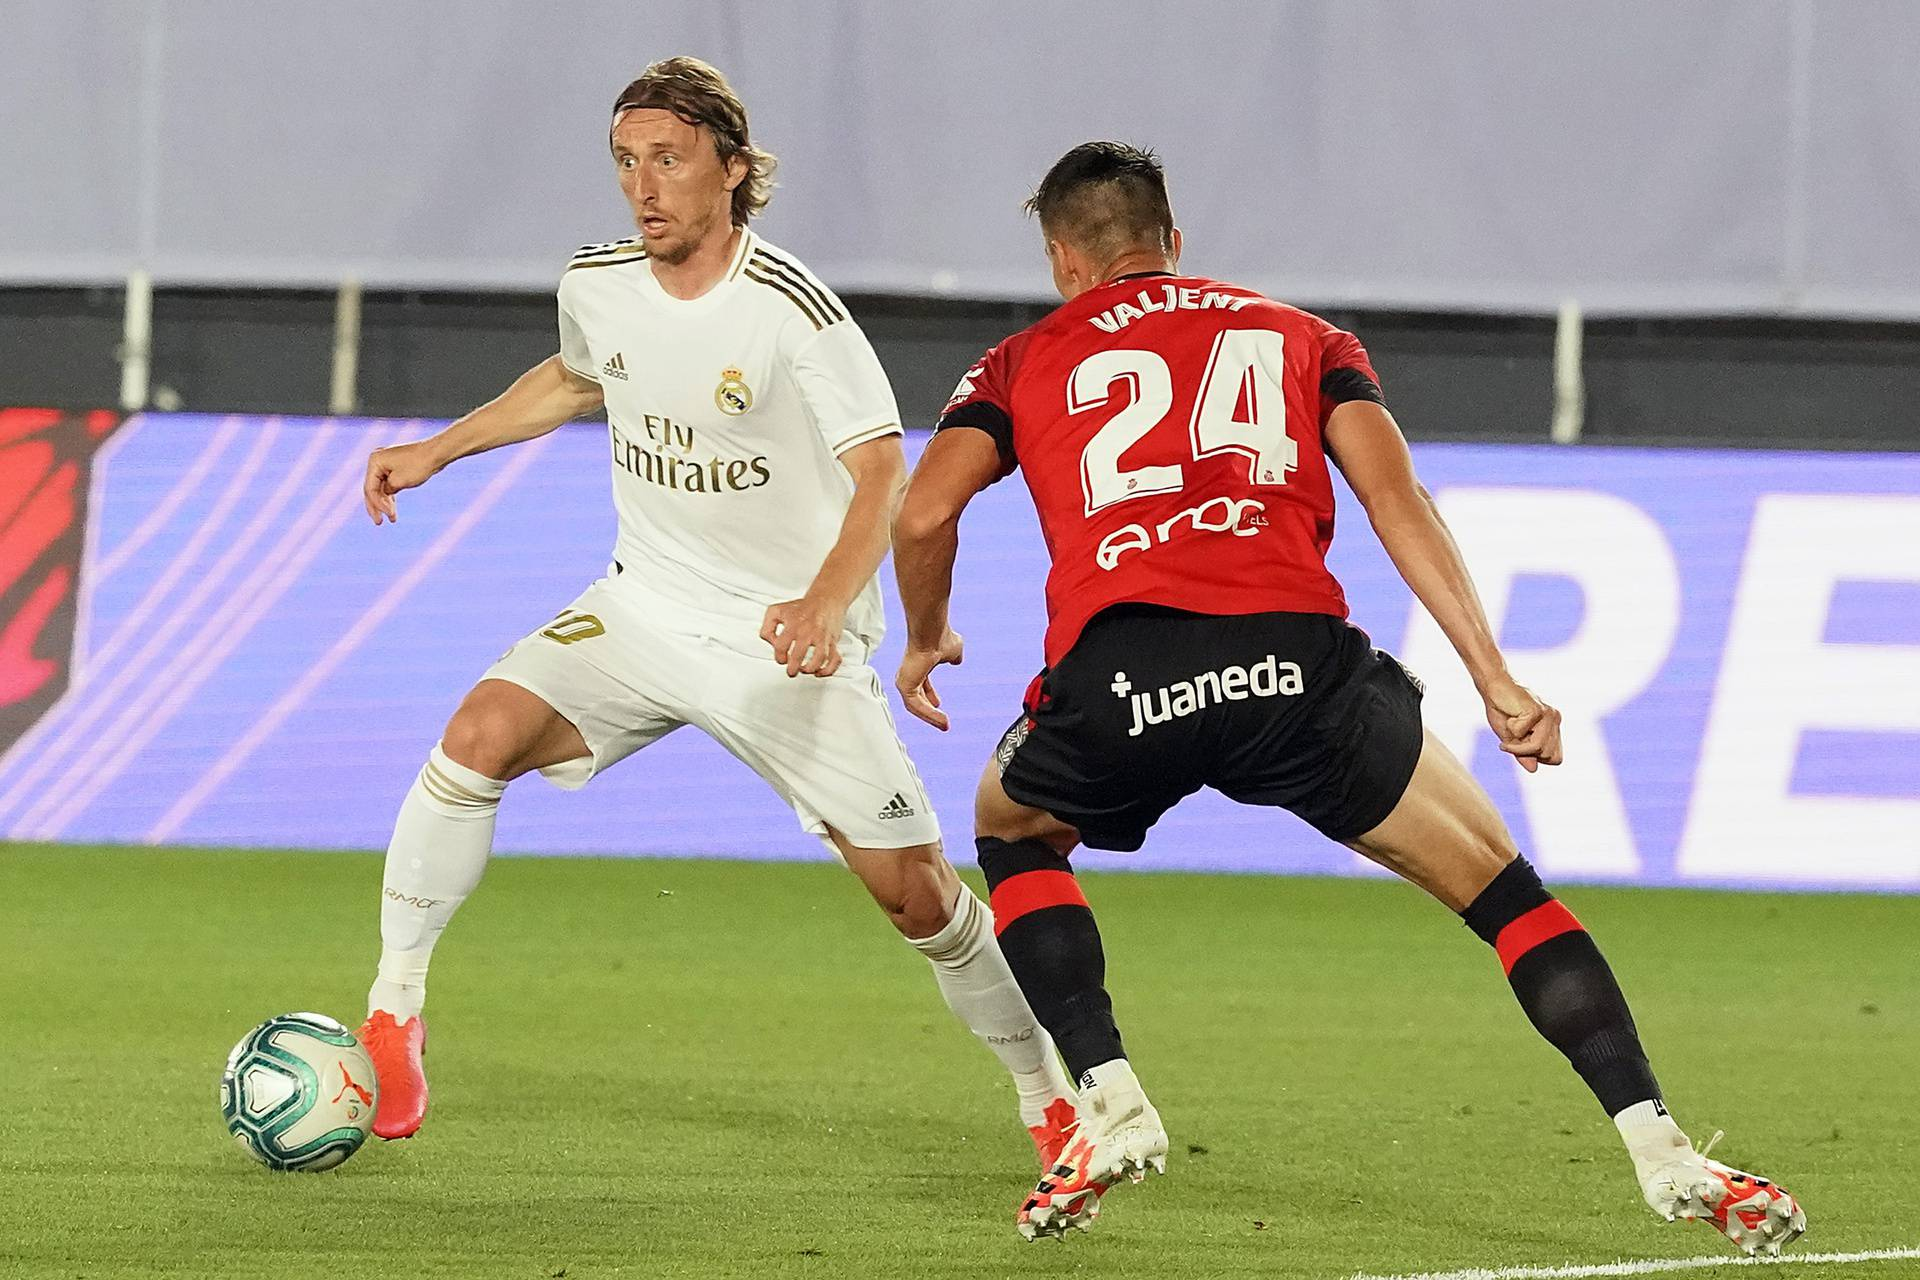 REAL MADRID v RCD MALLORCA. LA LIGA 2019/2020. ROUND 31.